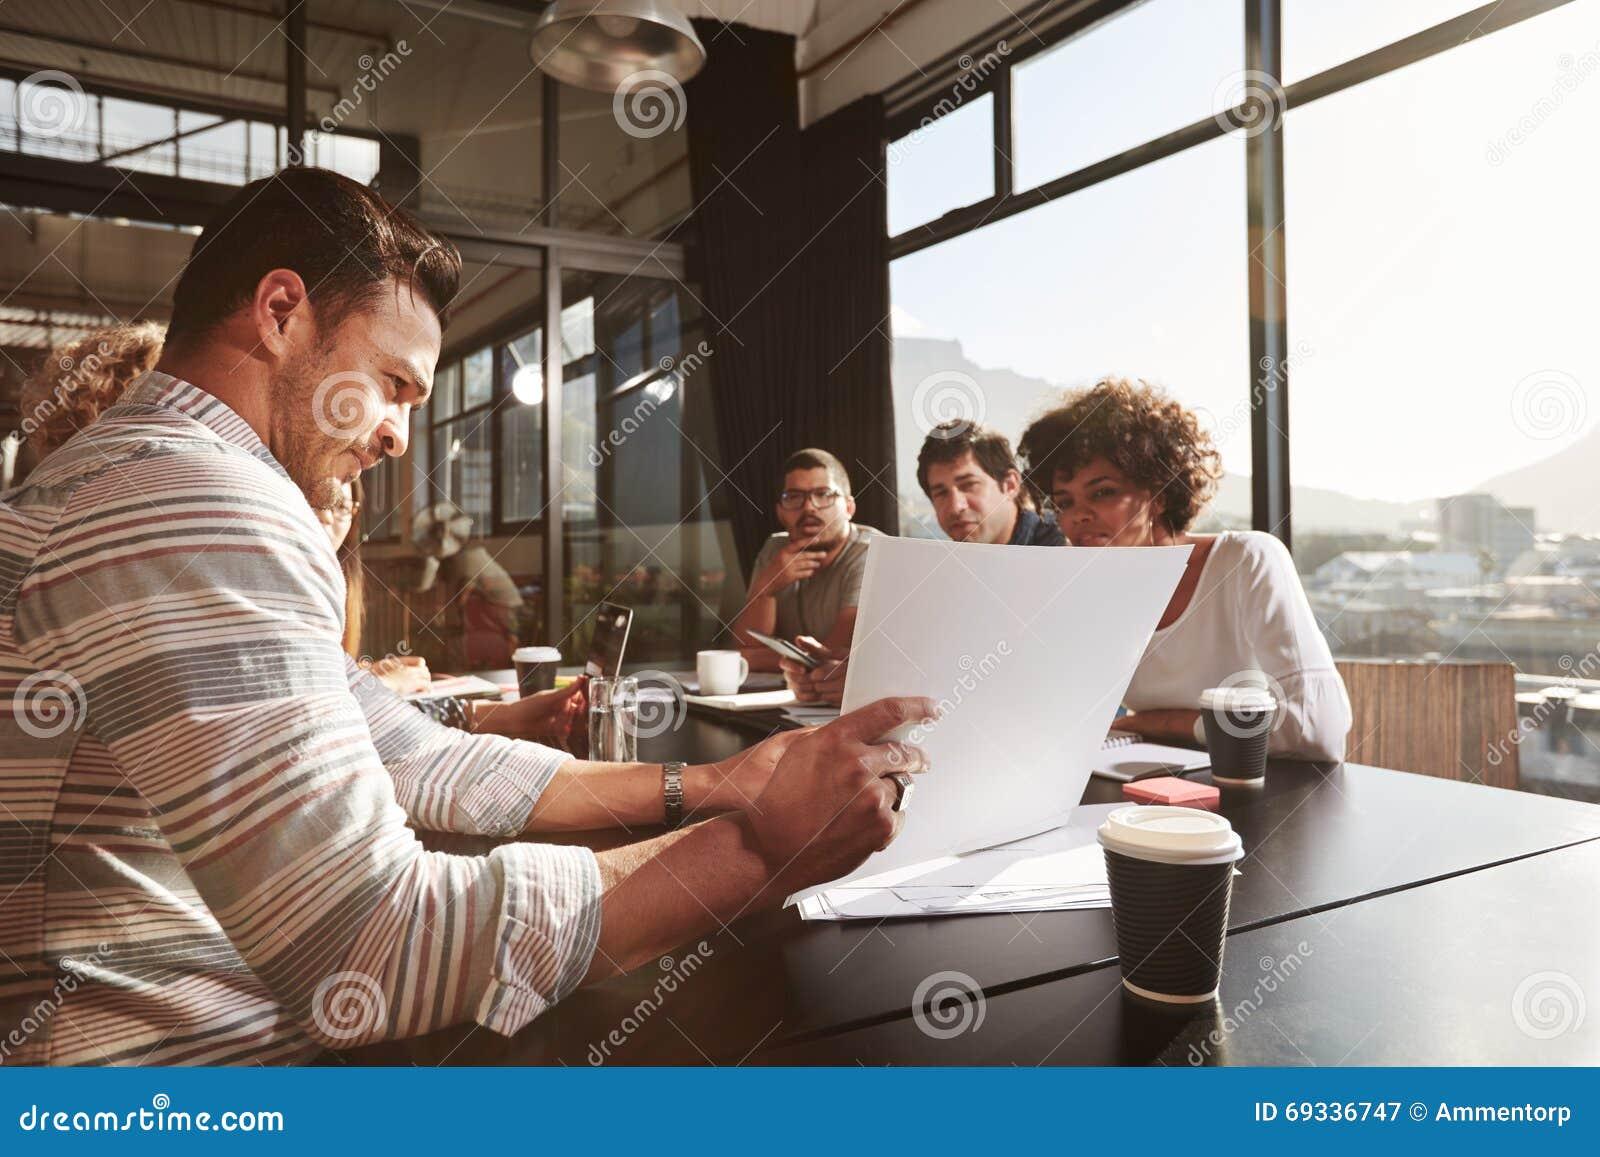 Businessman explaining business plan to his colleagues